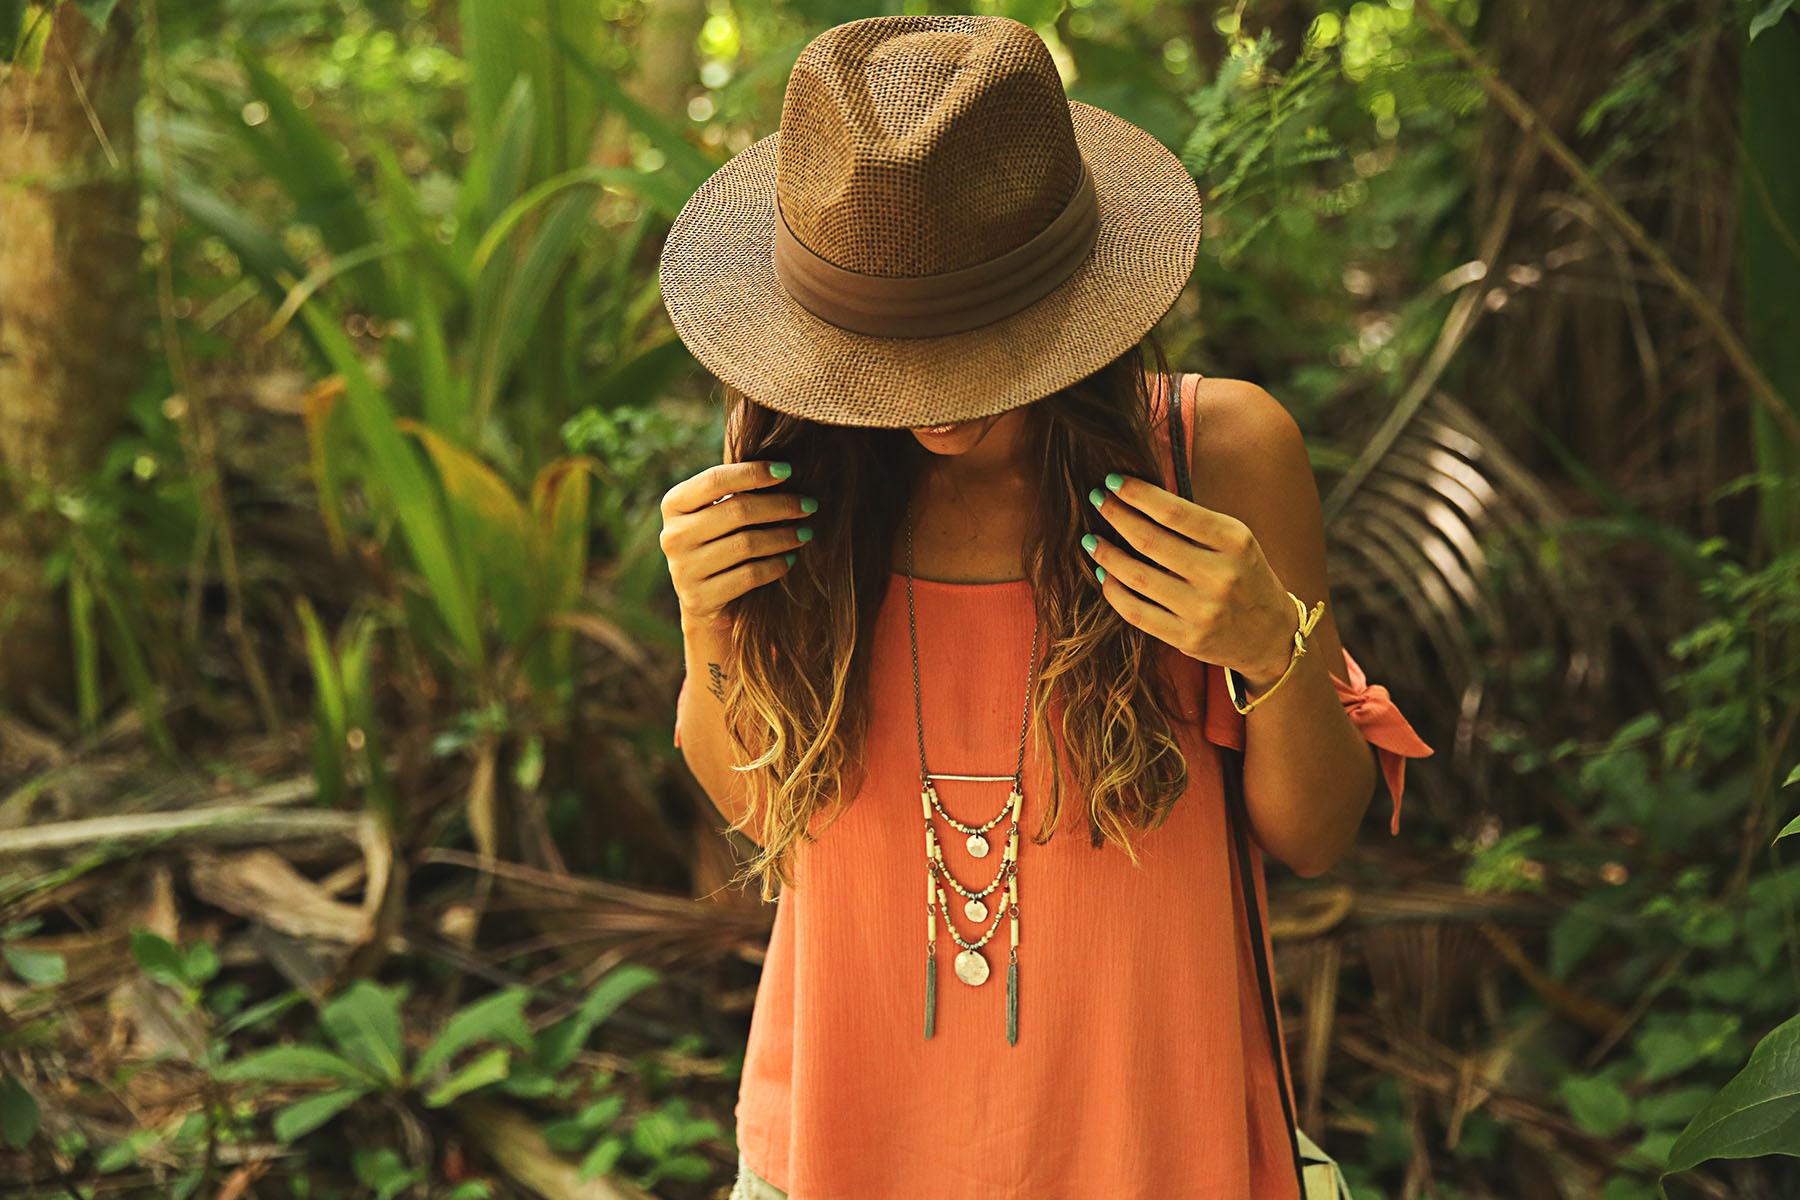 trendy-taste-look-outfit-street-style-ootd-blog-blogger-fashion-spain-moda-españa-boho-hippie-verano-birkenstock-bavaro-barcelo-khaki-caqui-shorts-sombrero-top-2